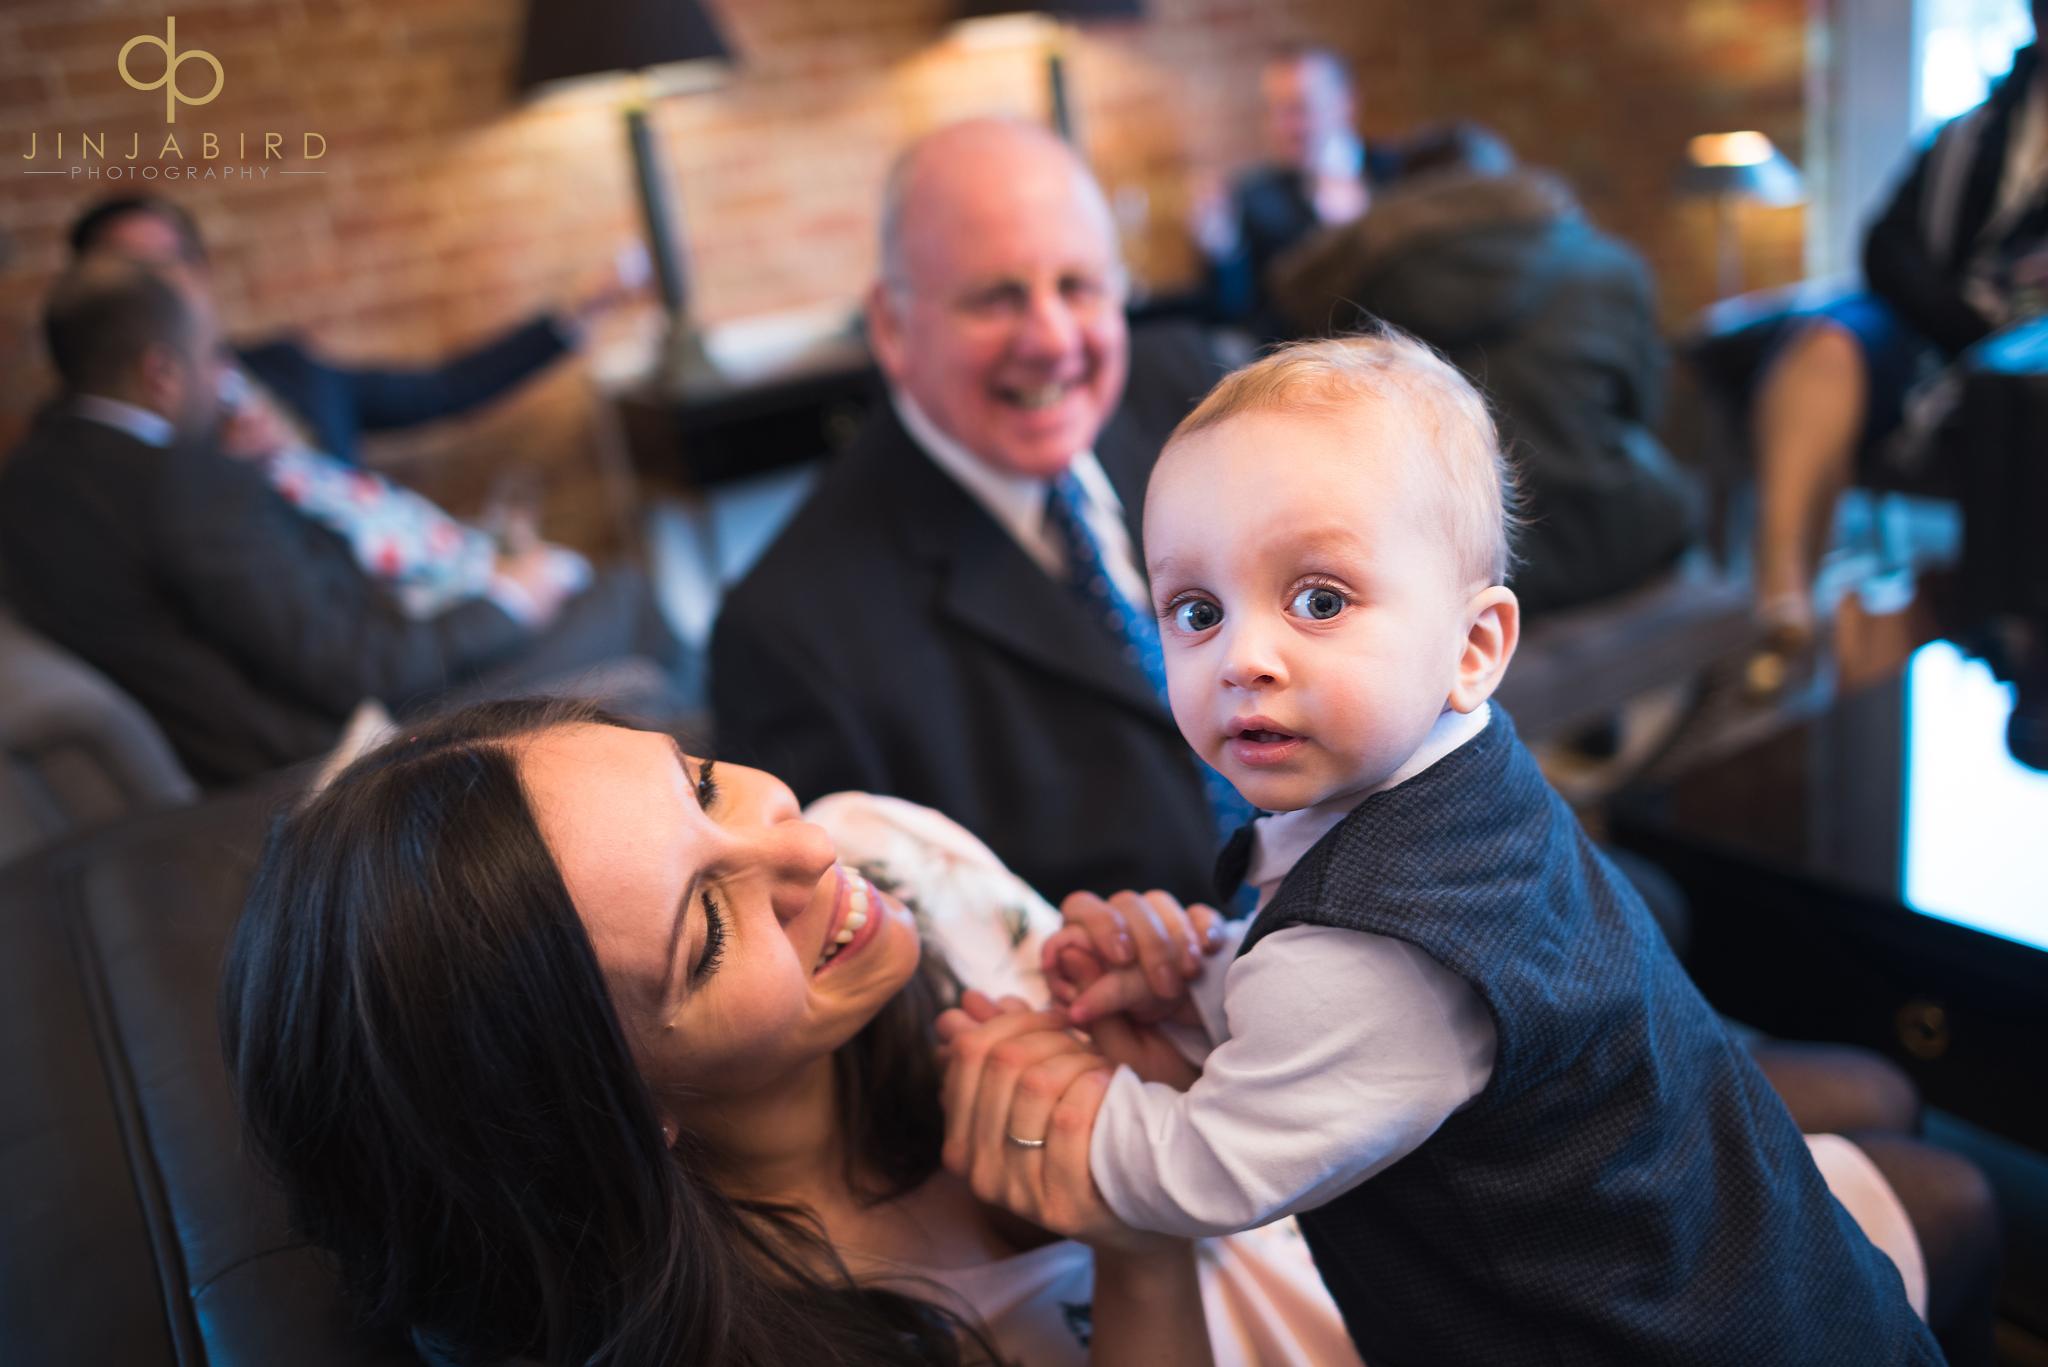 small-boy-at-wedding